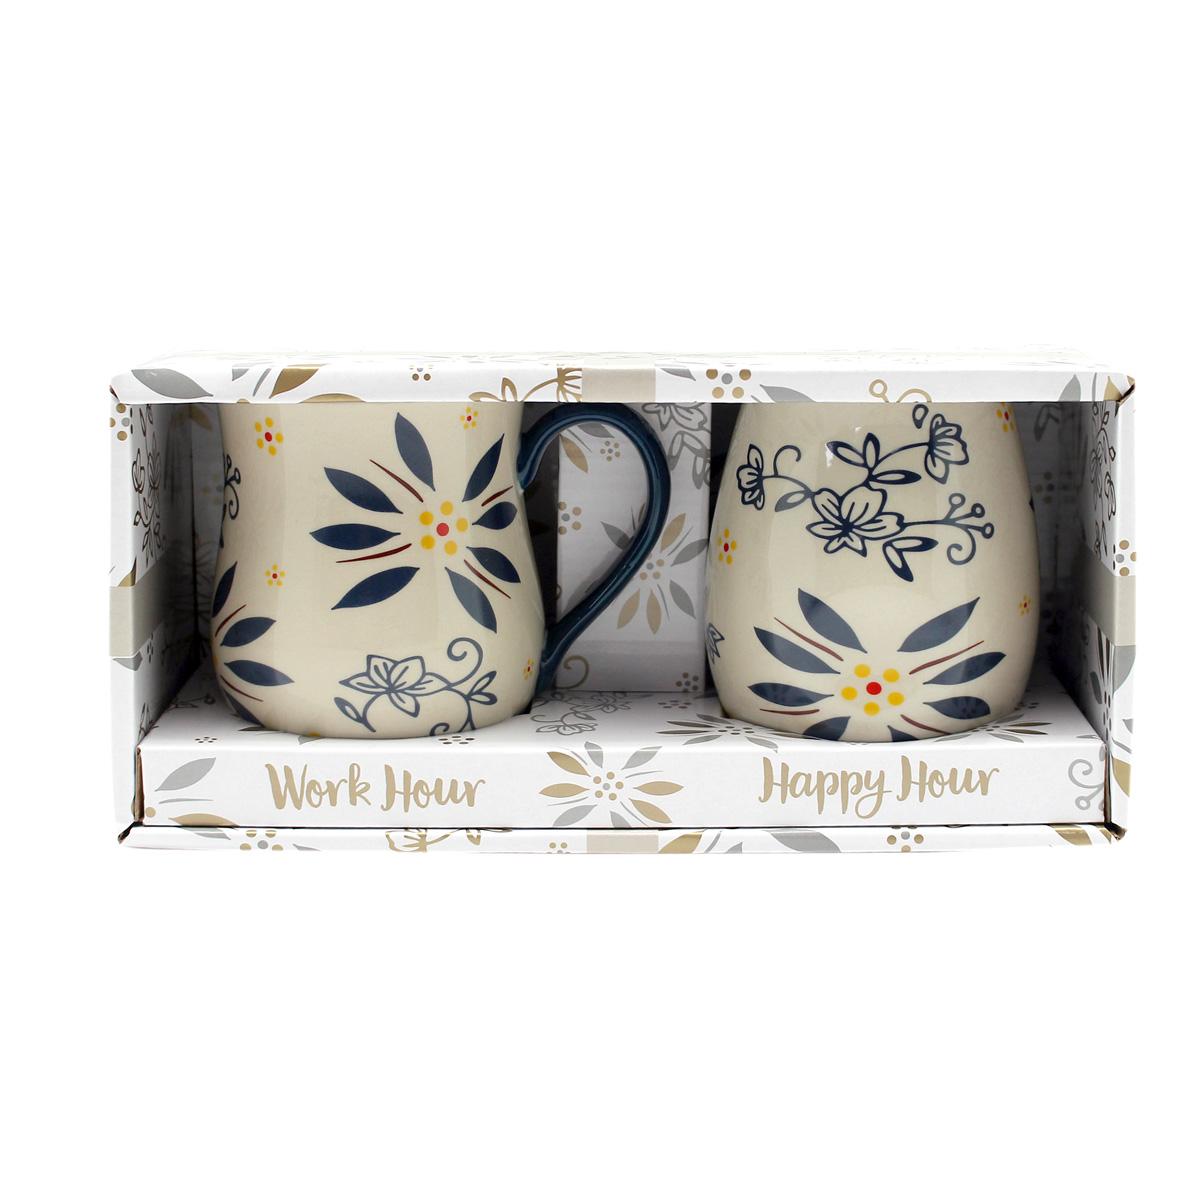 temp-tations® Day and Night Mug Gift Set – 2 Piece – Blue